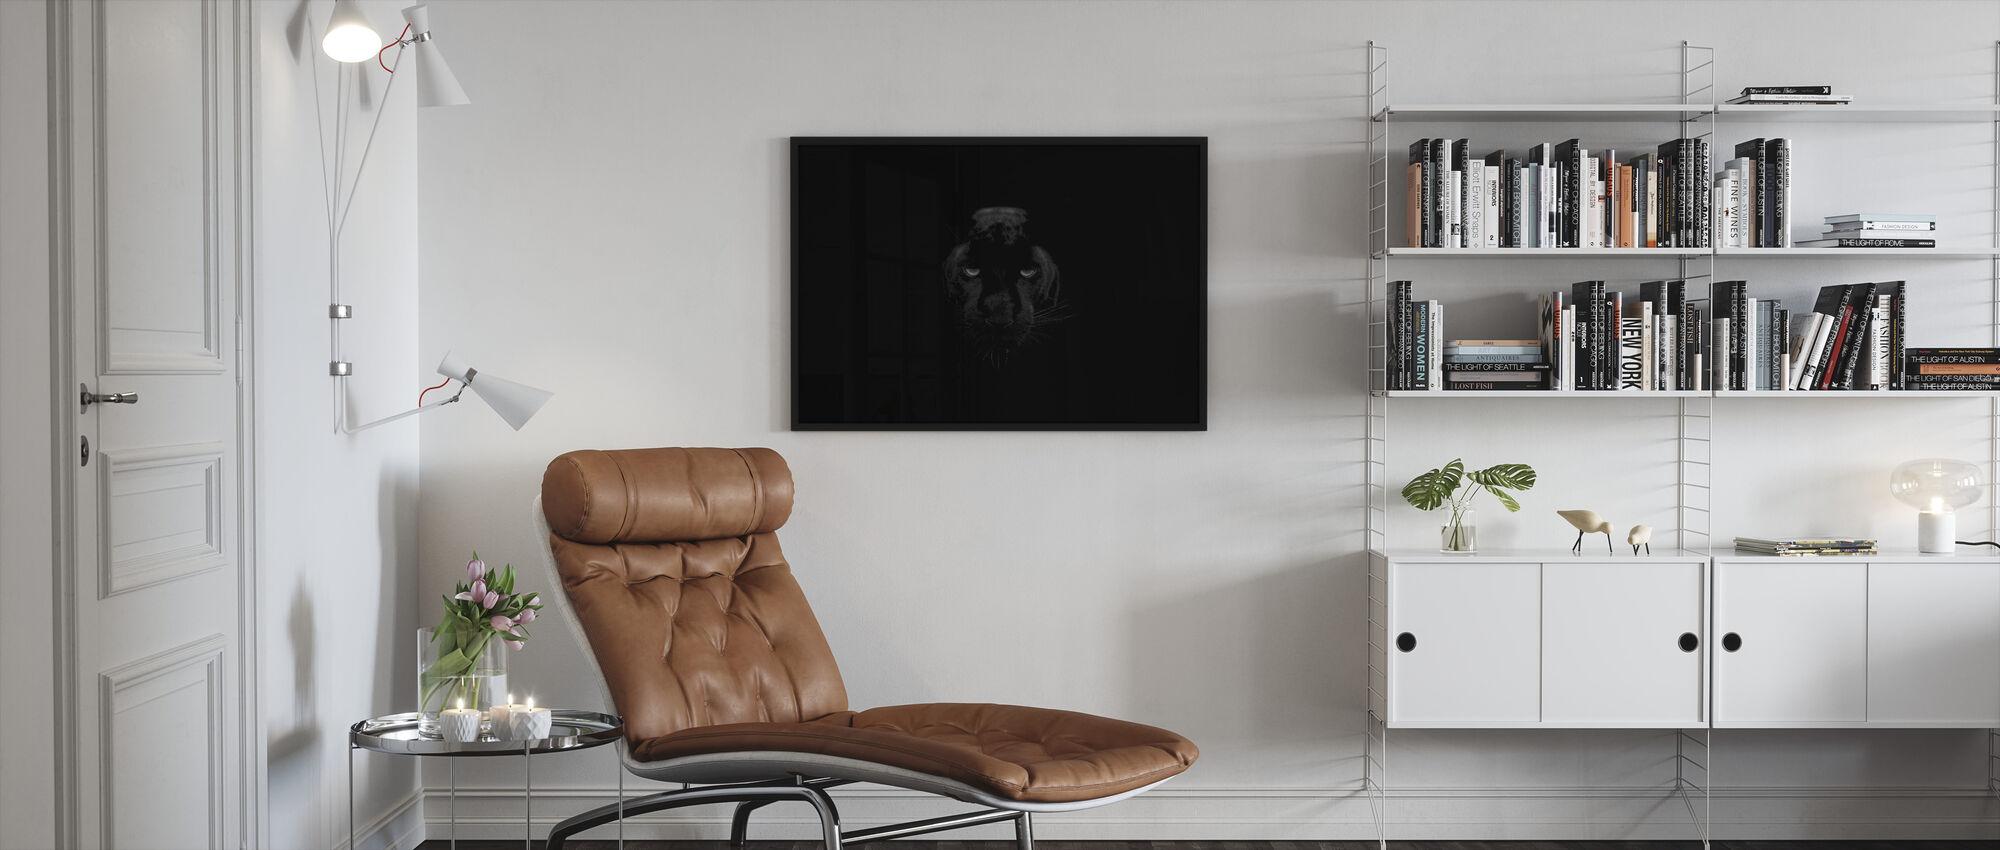 Panther Monochrome - Framed print - Living Room